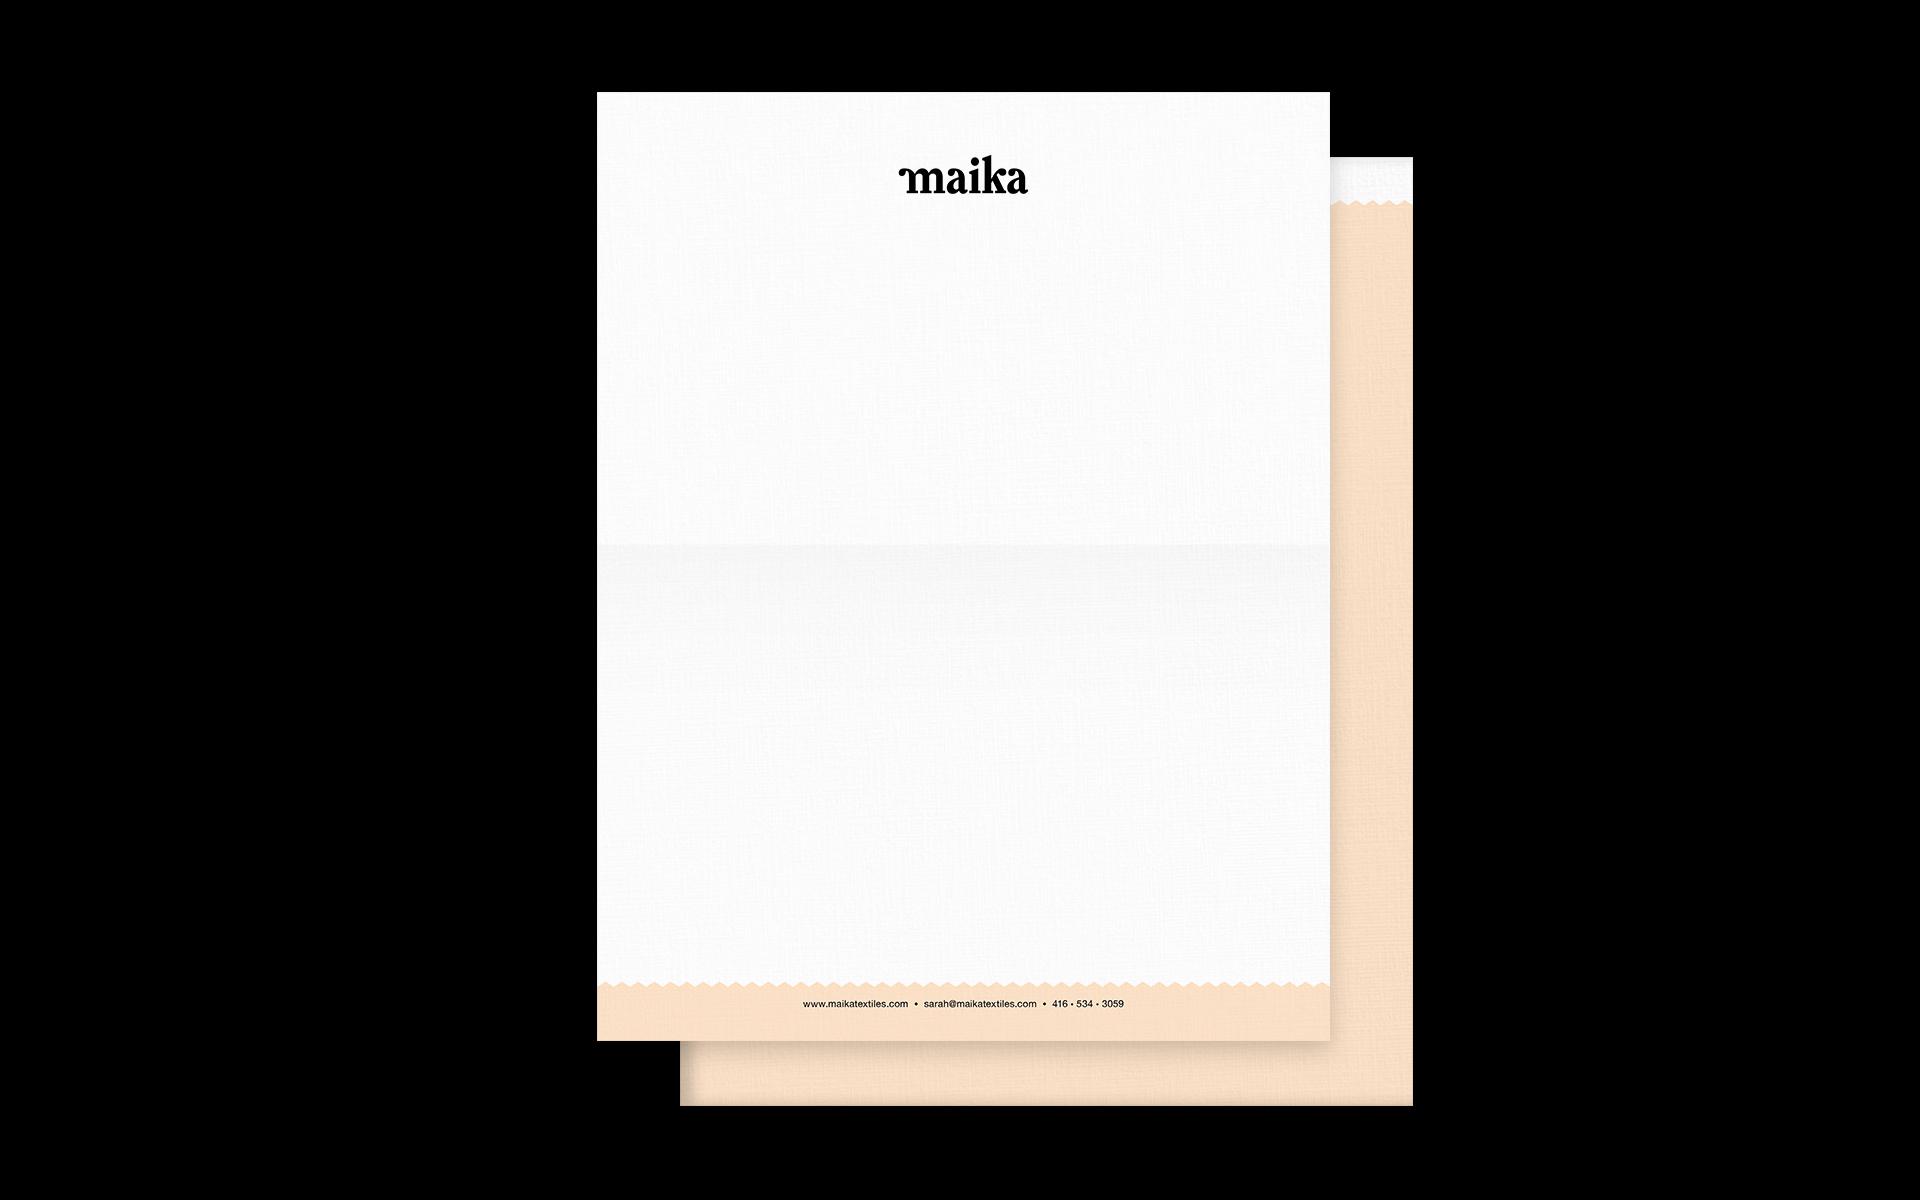 Maika_v01Letterhead-1